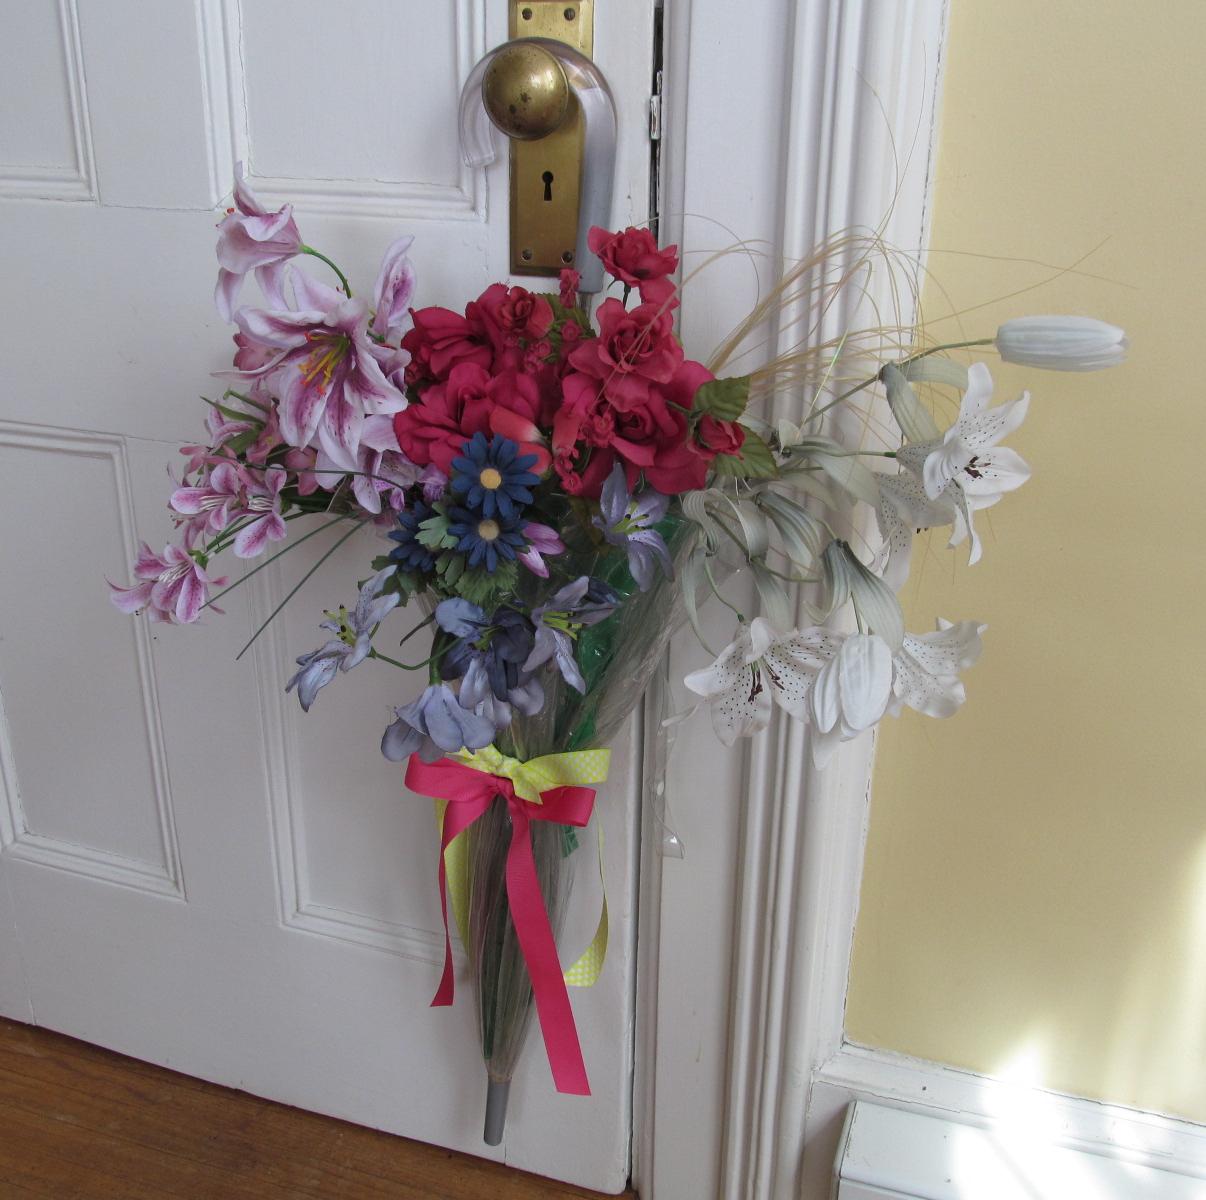 Suzefashion Handmade Diy Spring Door Decoration